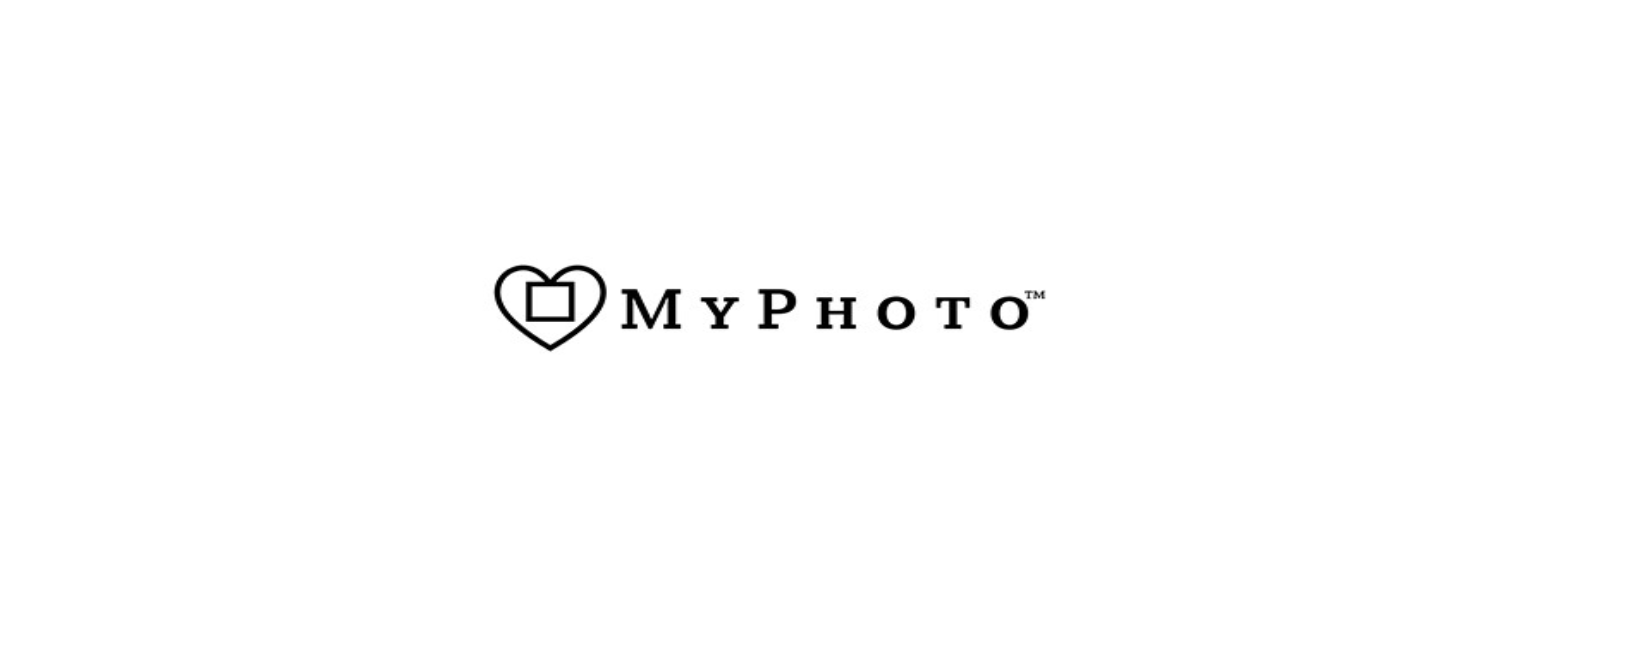 myphoto Discount Code 2021